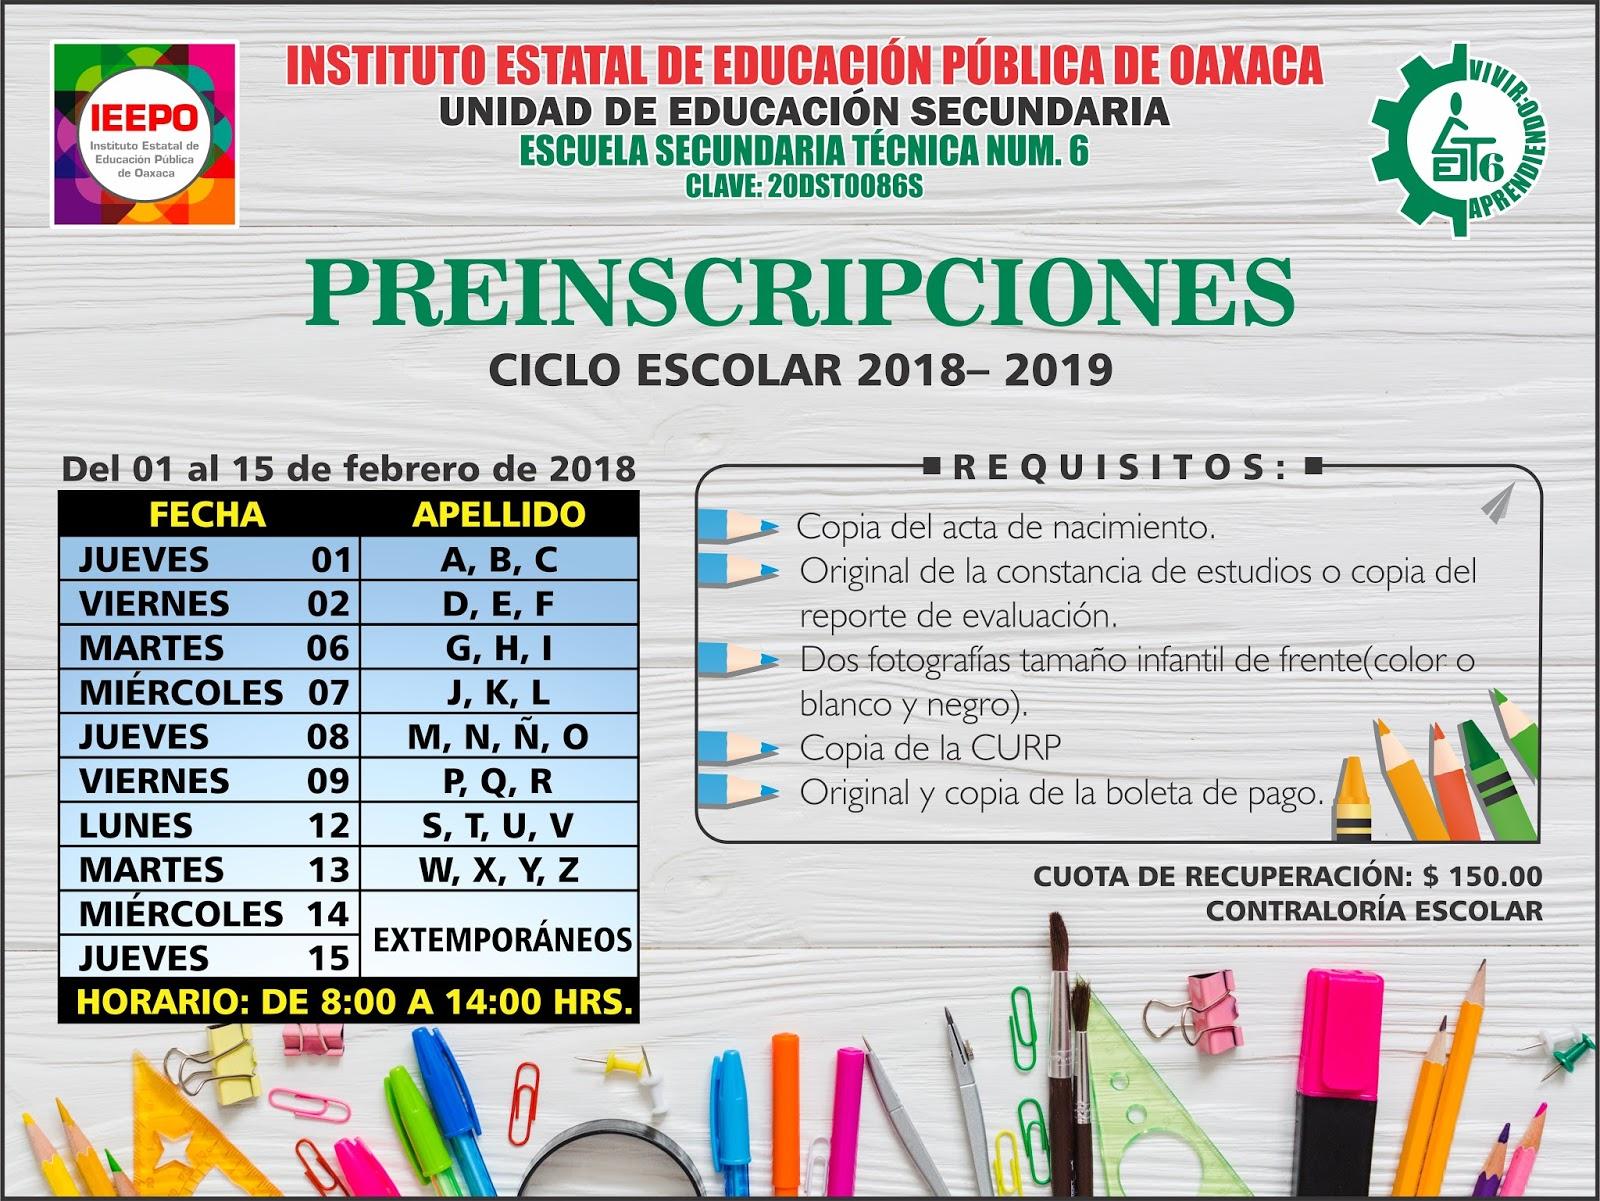 Escuela secundaria t cnica n m 6 for Cct de la escuela